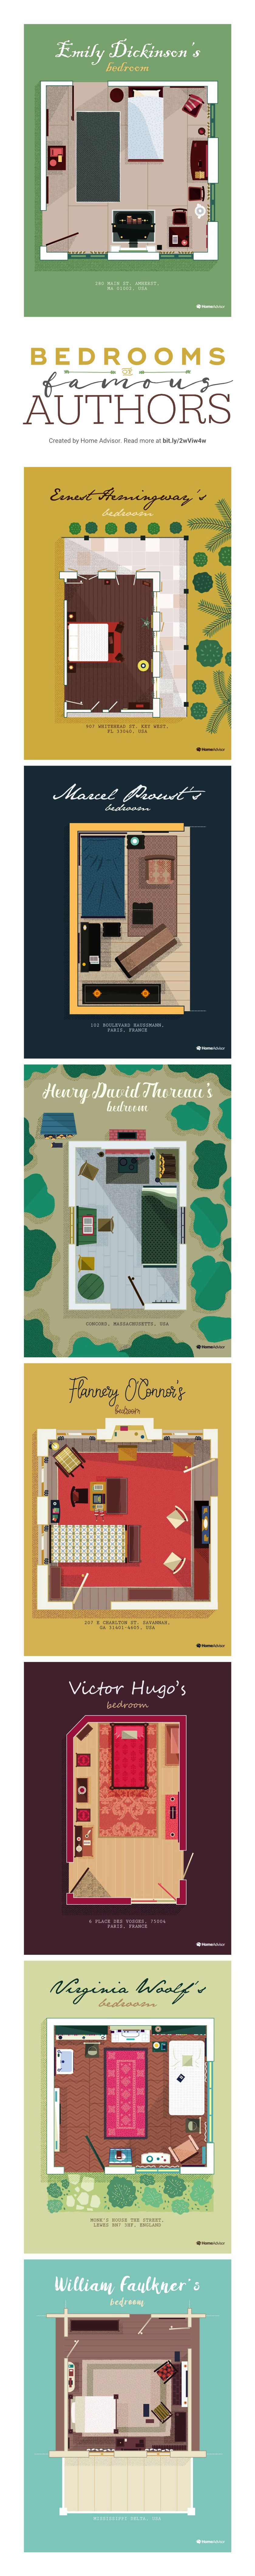 Floor plans of famous authors' bedrooms